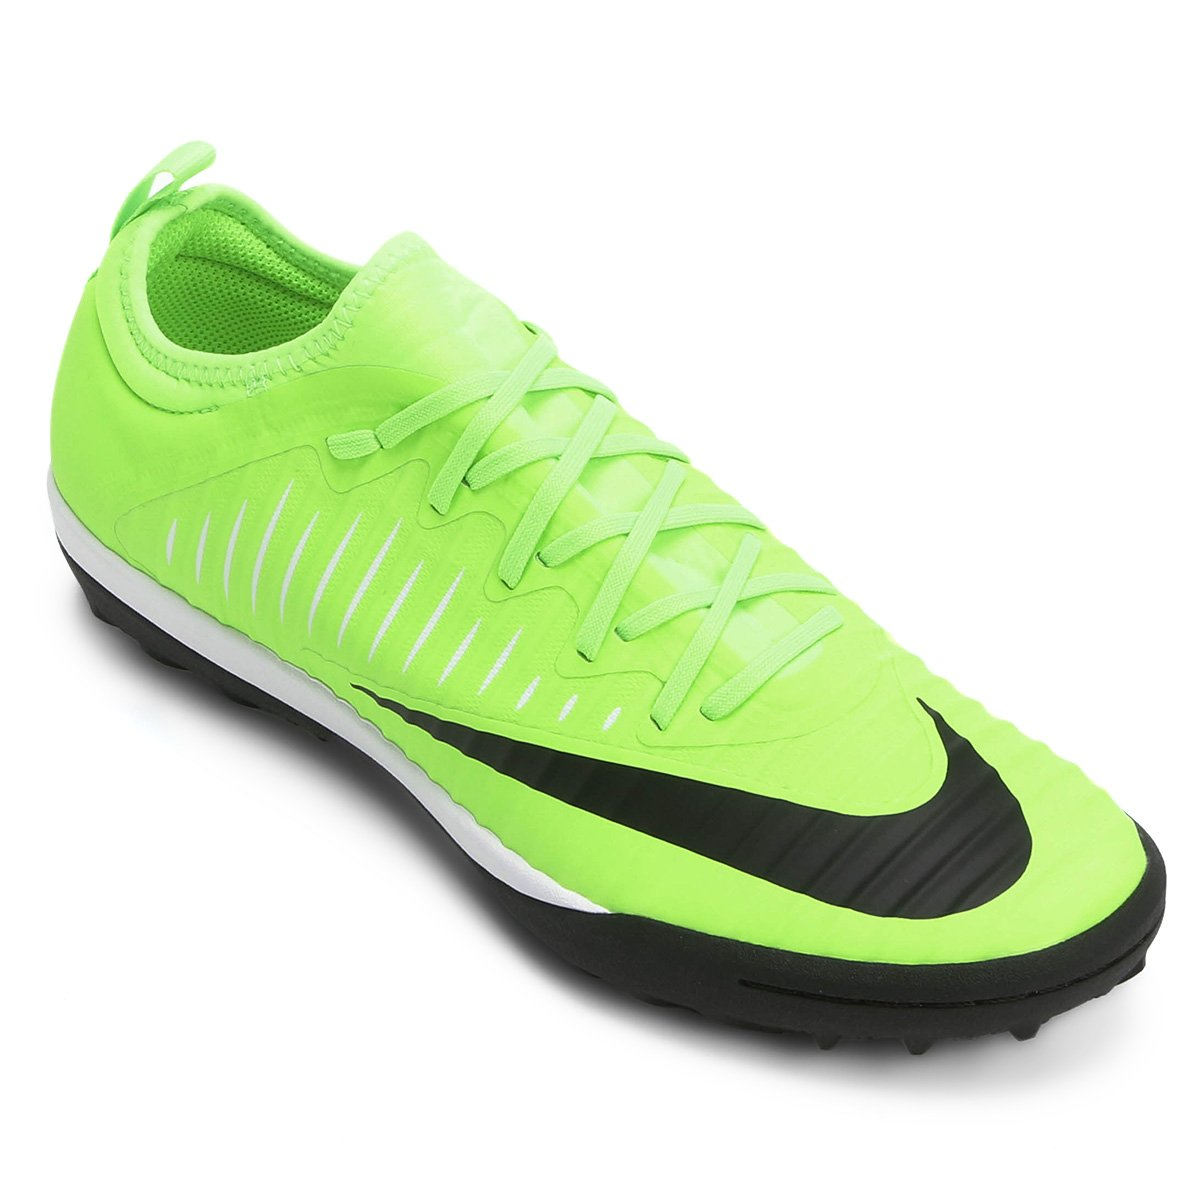 Chuteira Society Nike Mercurial Finale 2 TF Masculina - Verde e . 12083dceaad9e